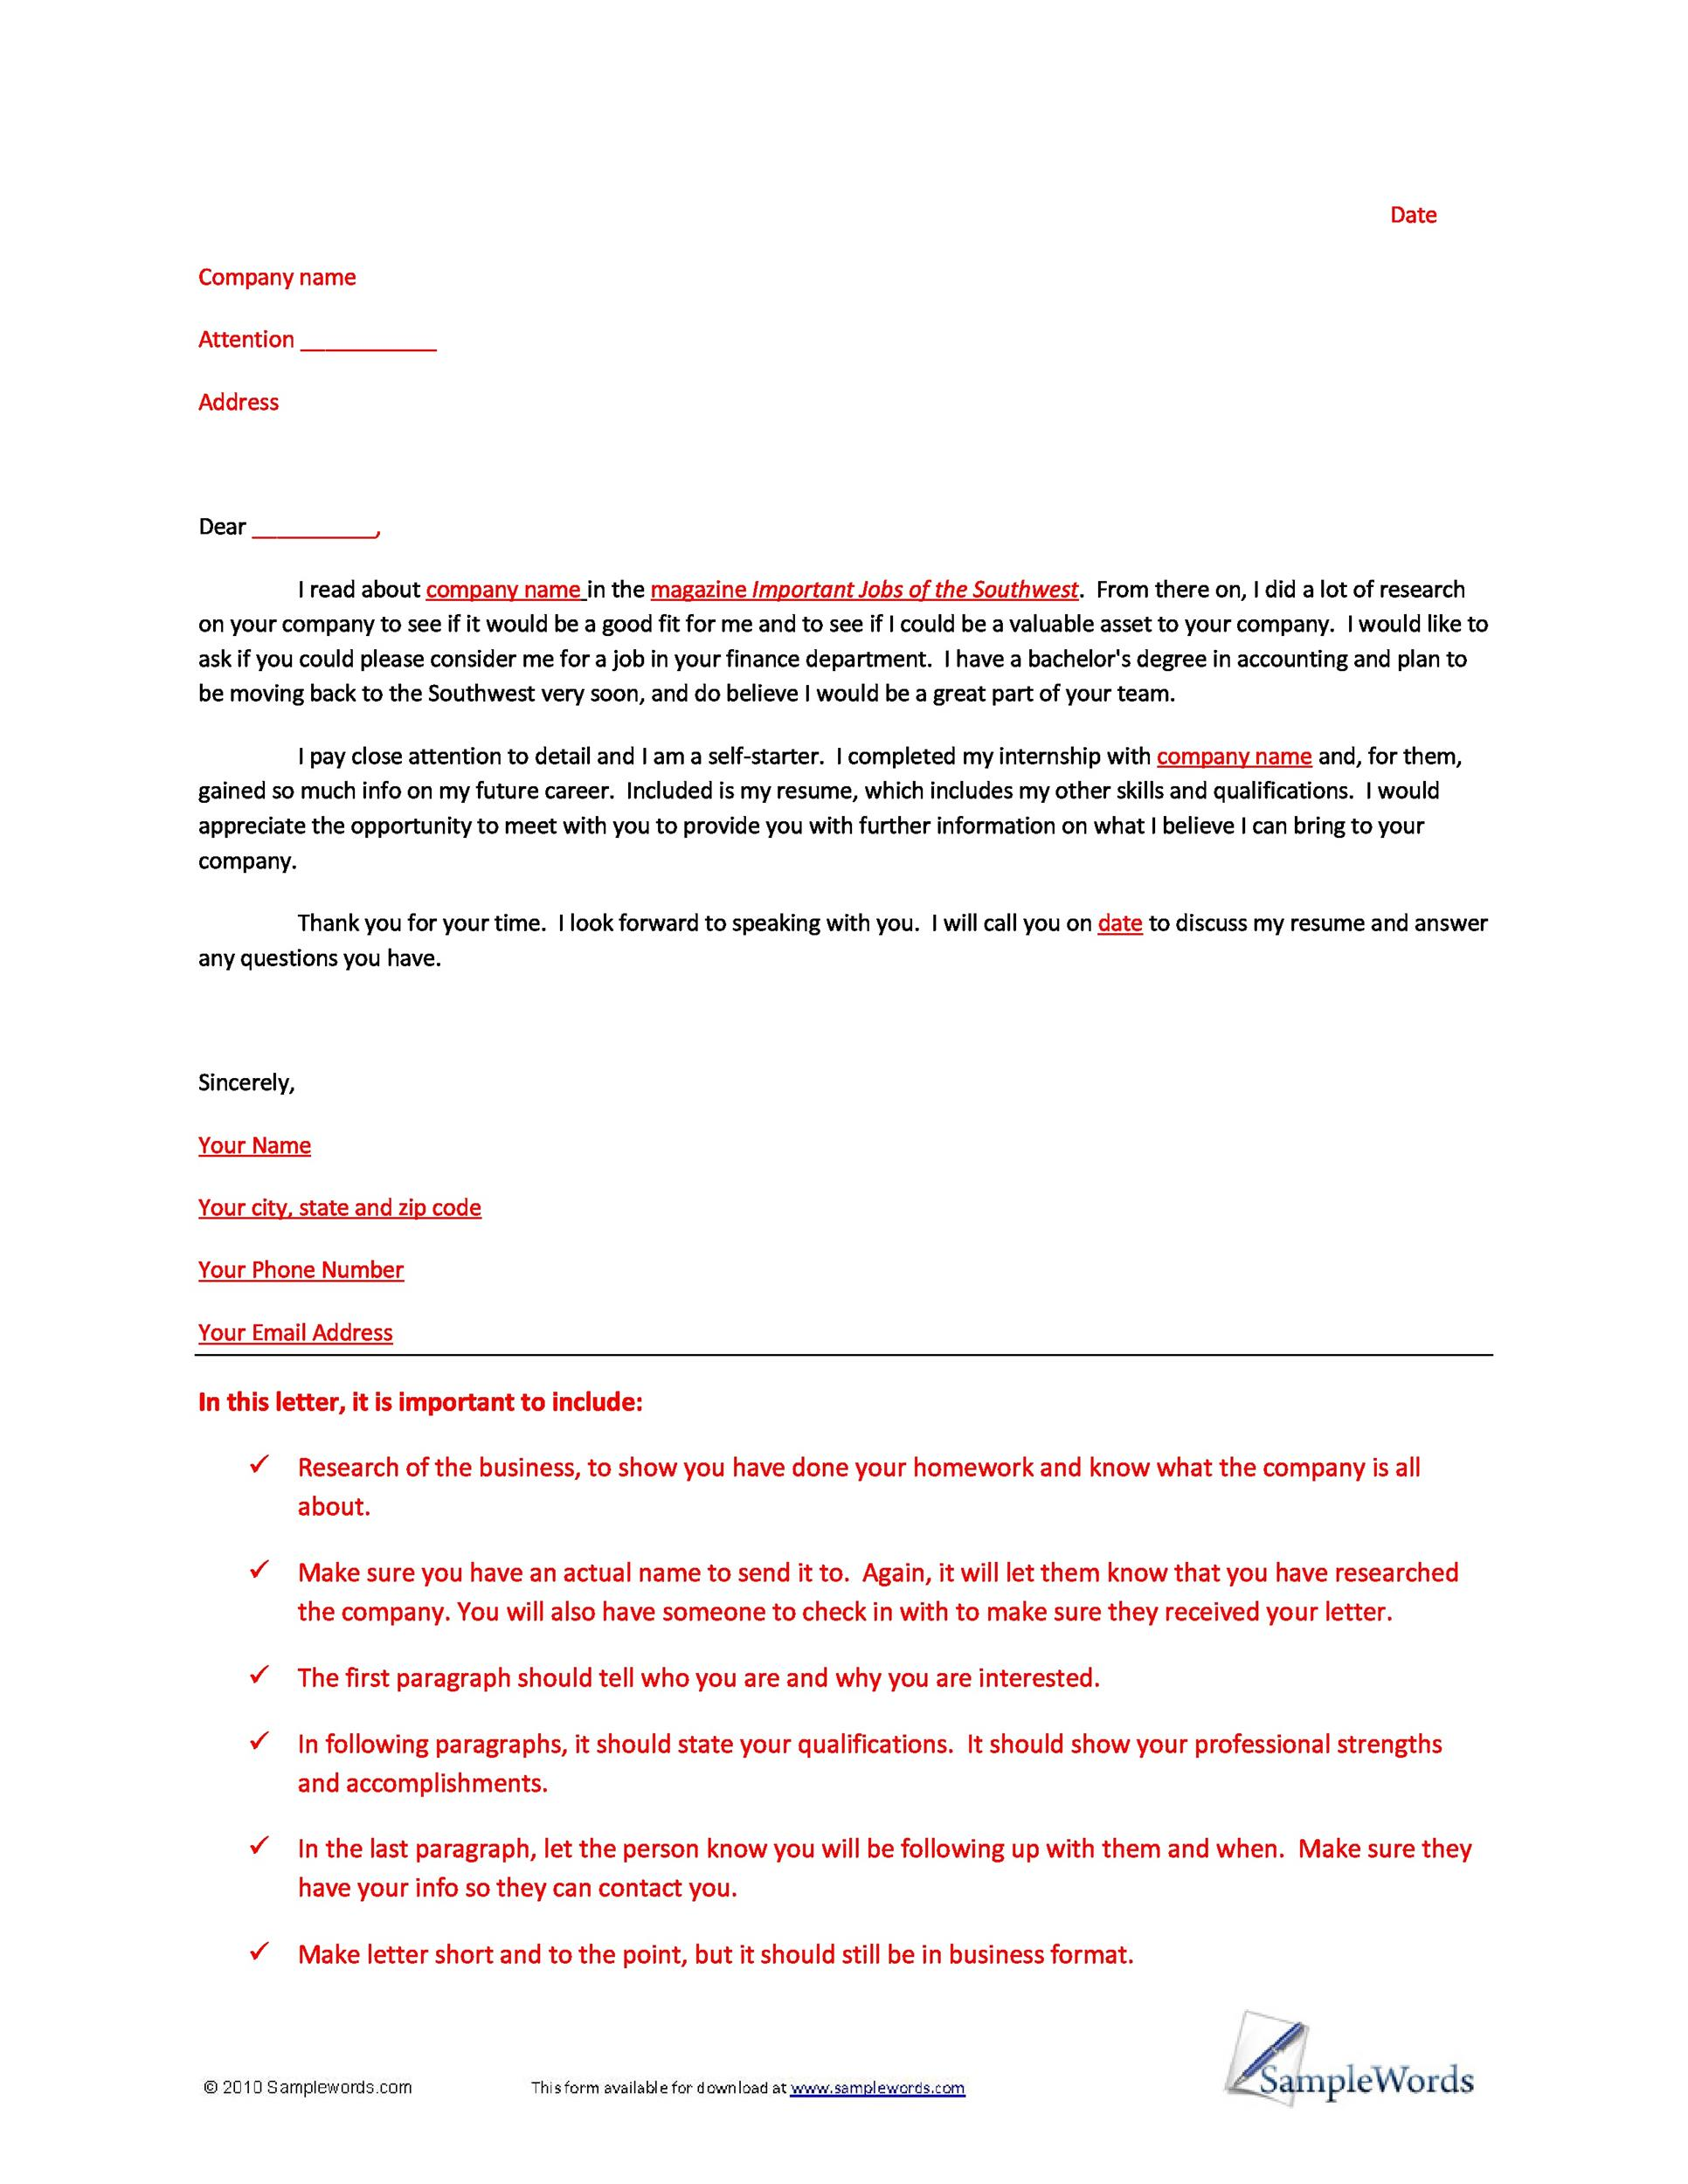 Free letter of interest 06